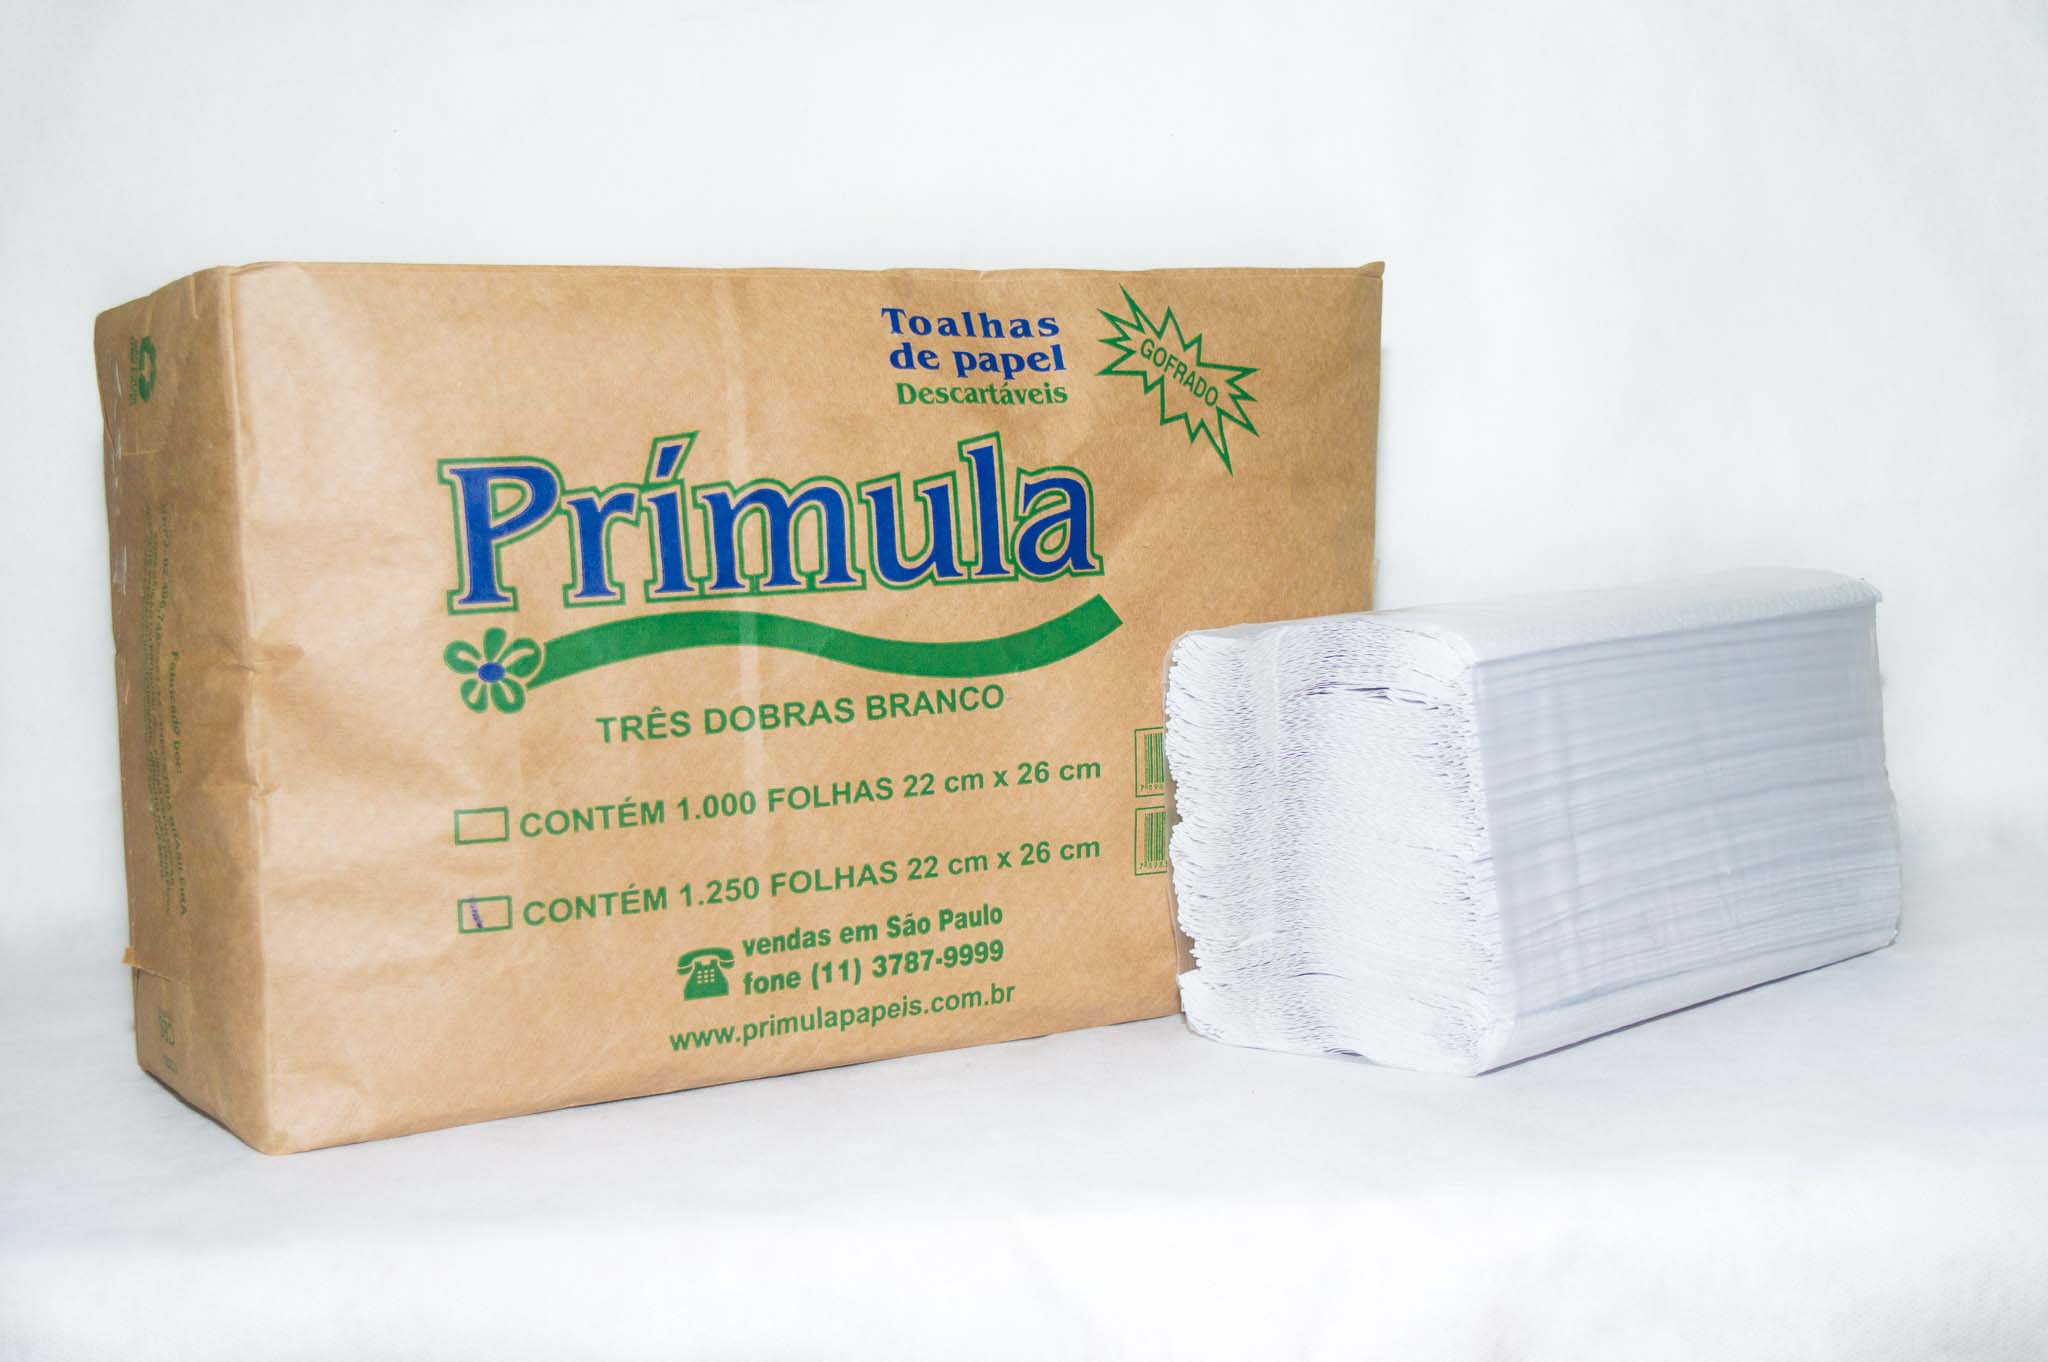 Empresas fabricantes de papel toalha